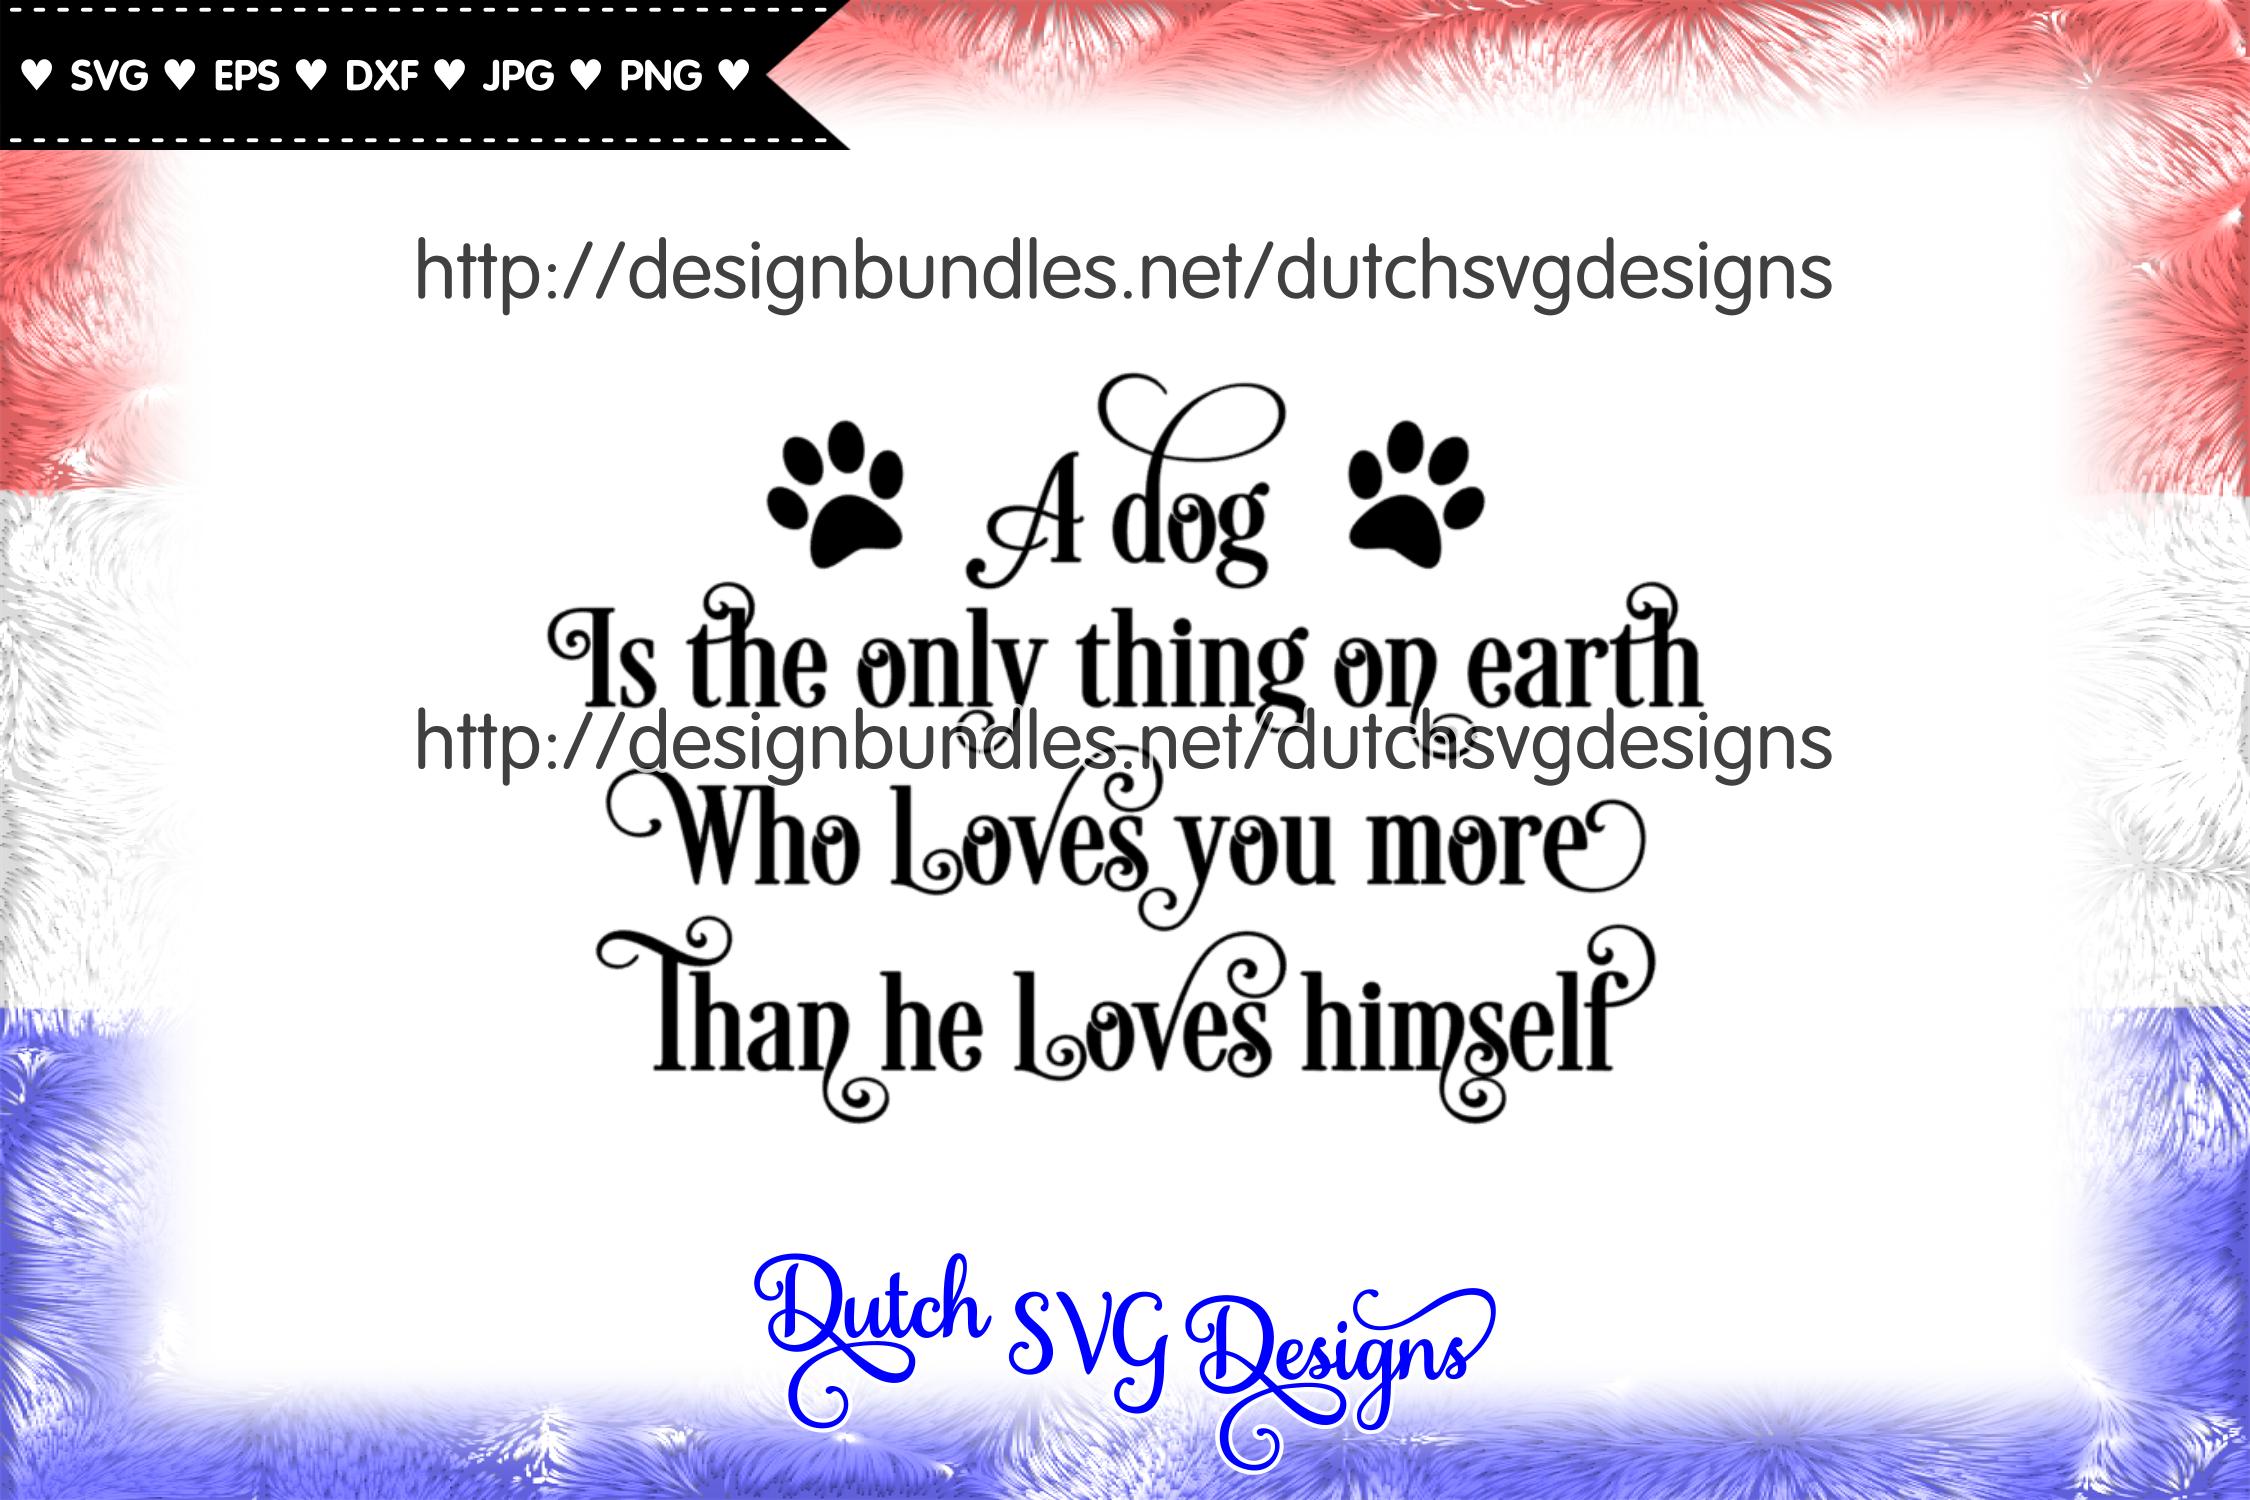 Dog text cut file, dog svg, dog cutting file, dog cut file example image 1